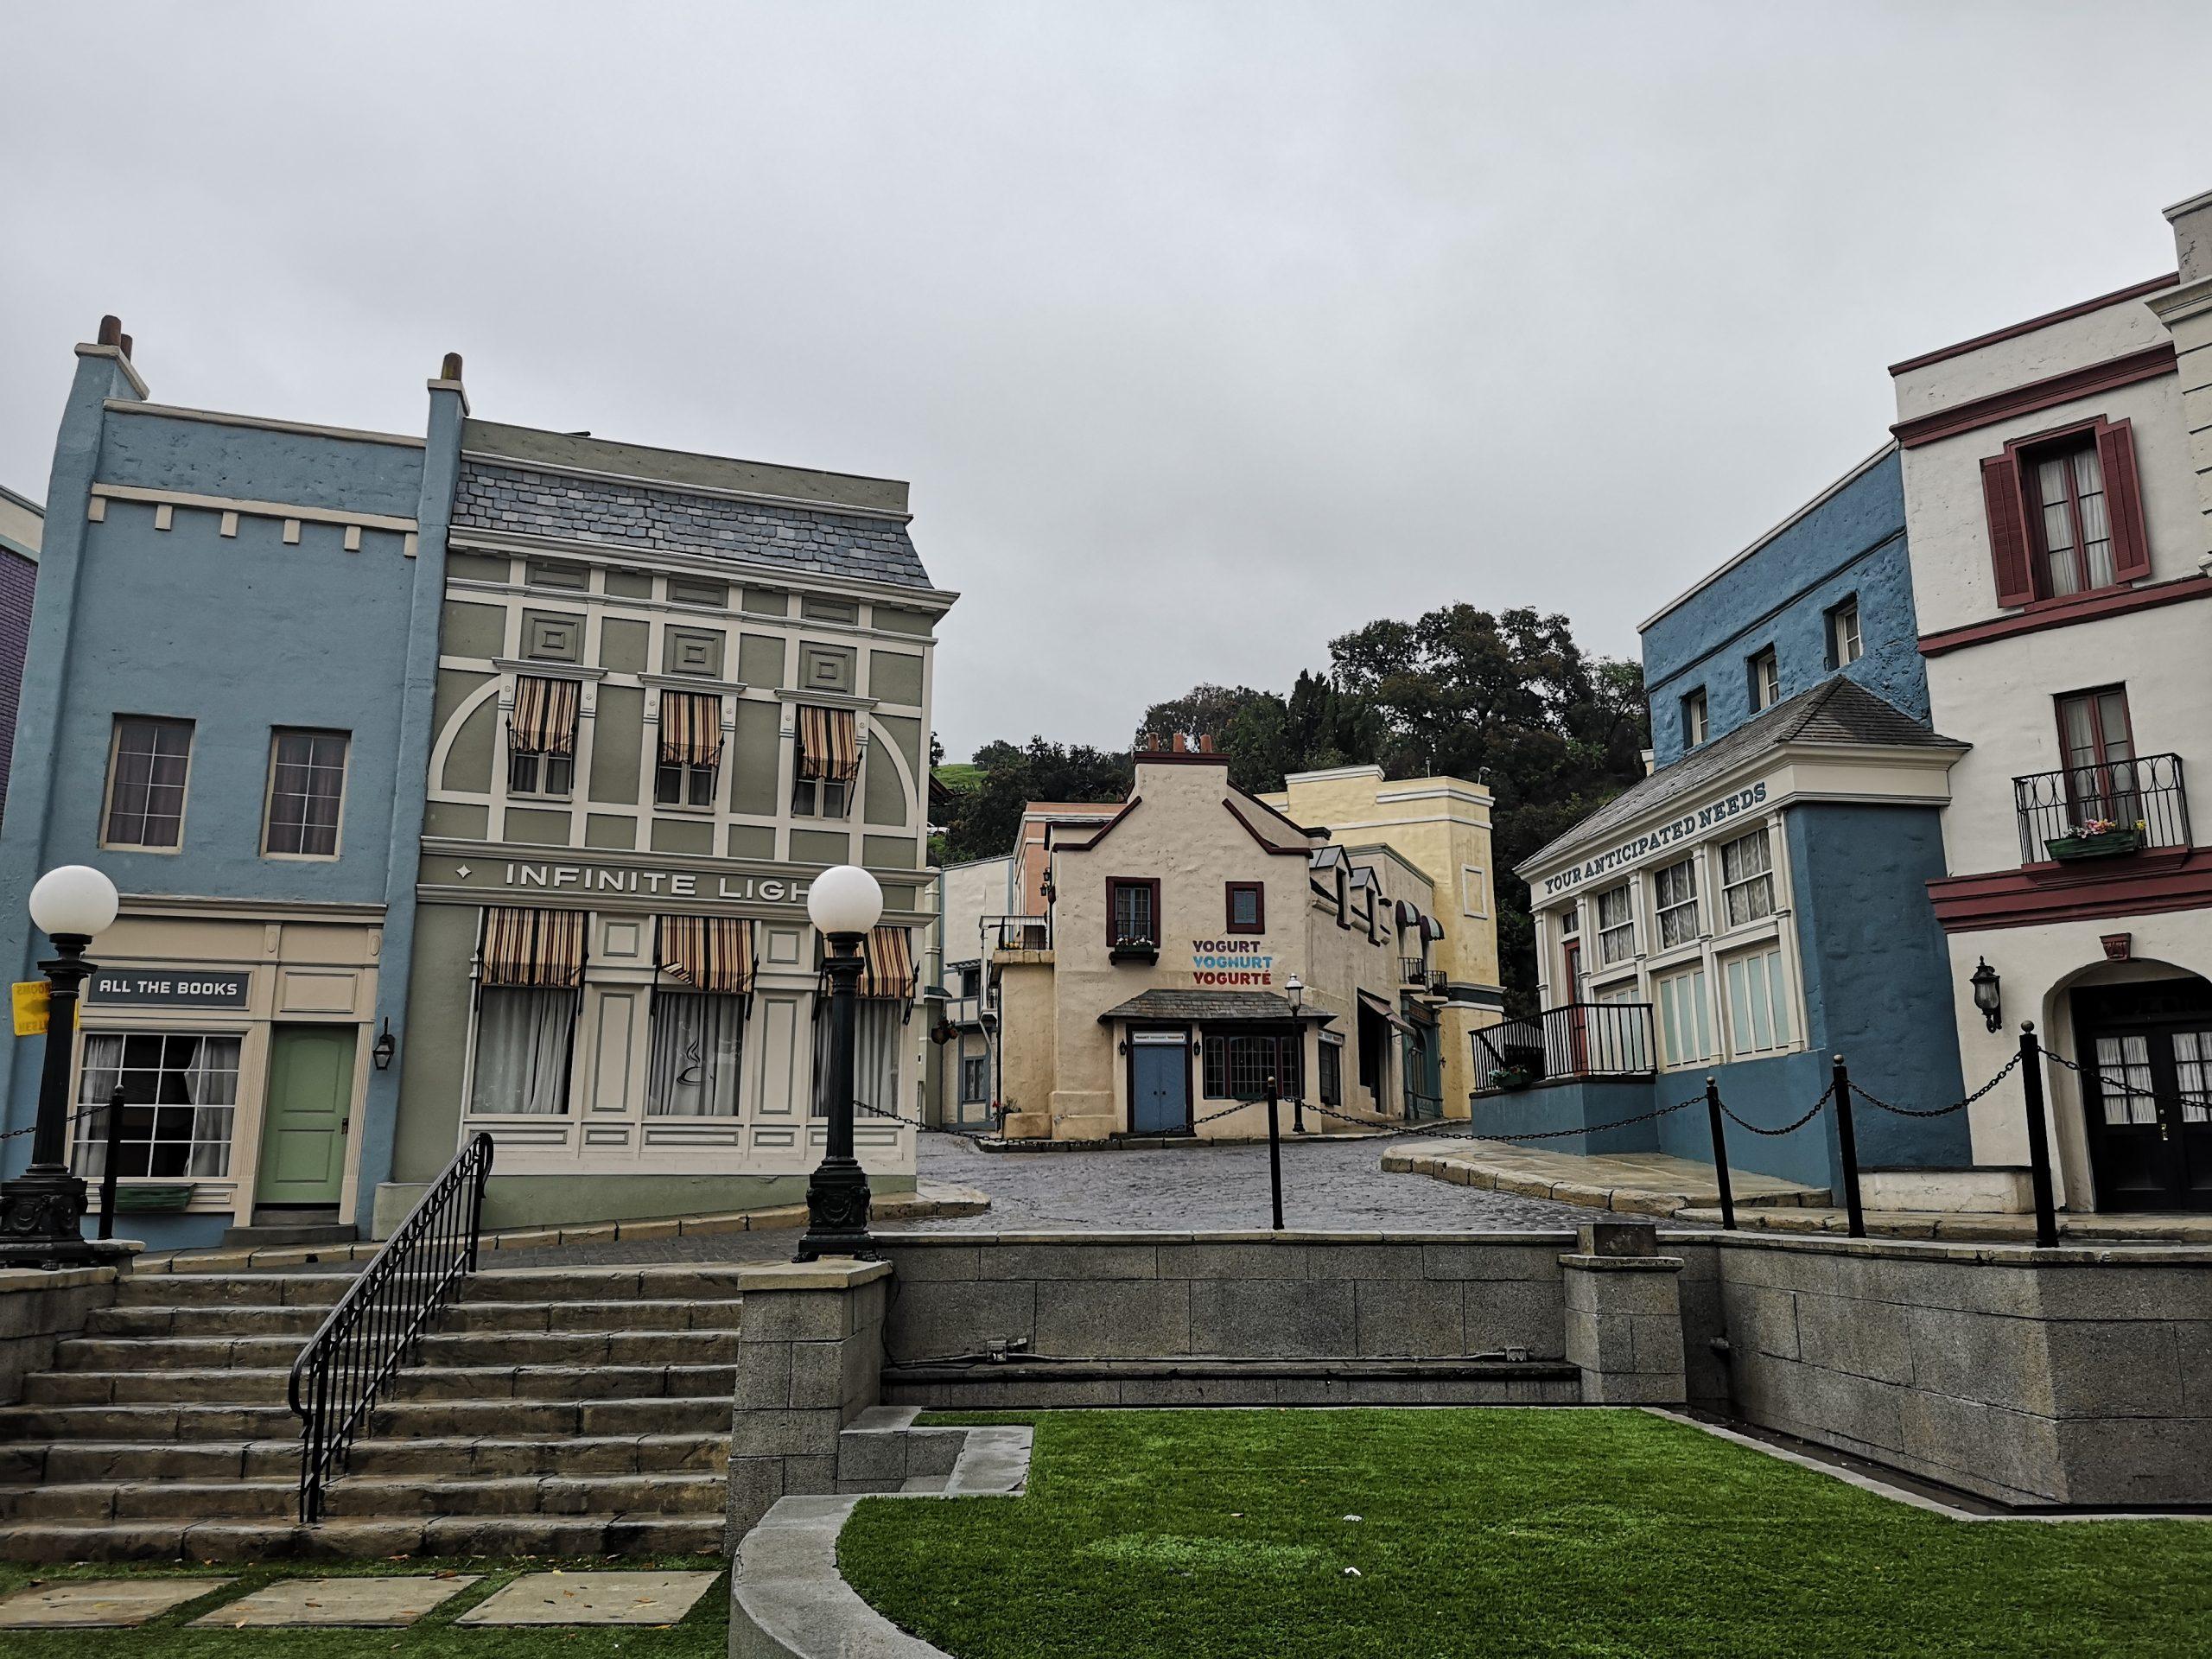 Universal Studios Hollywood backlot